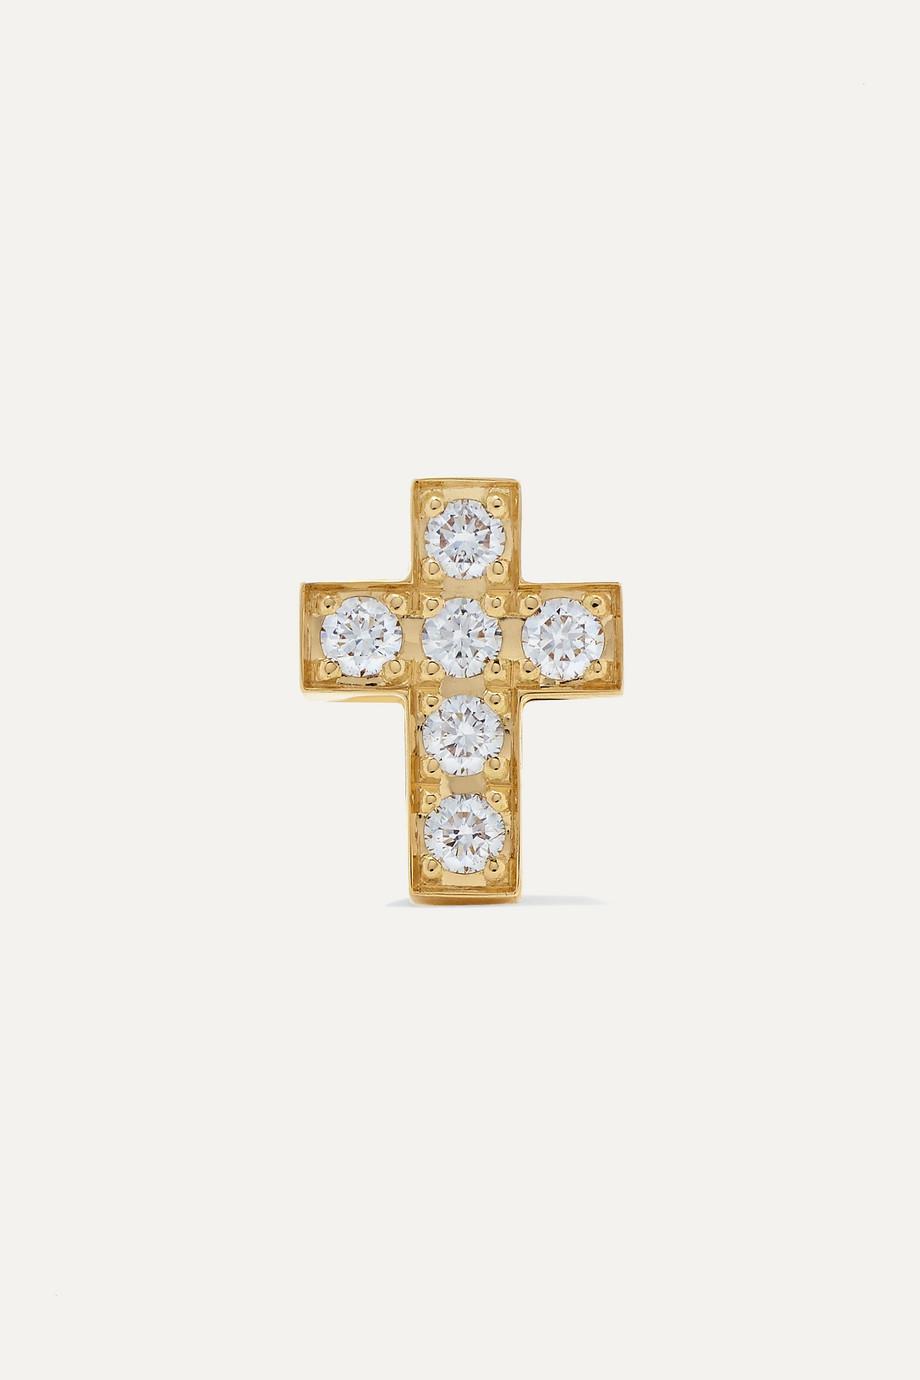 Sophie Bille Brahe Giulietta Oreille 18-karat gold diamond earring